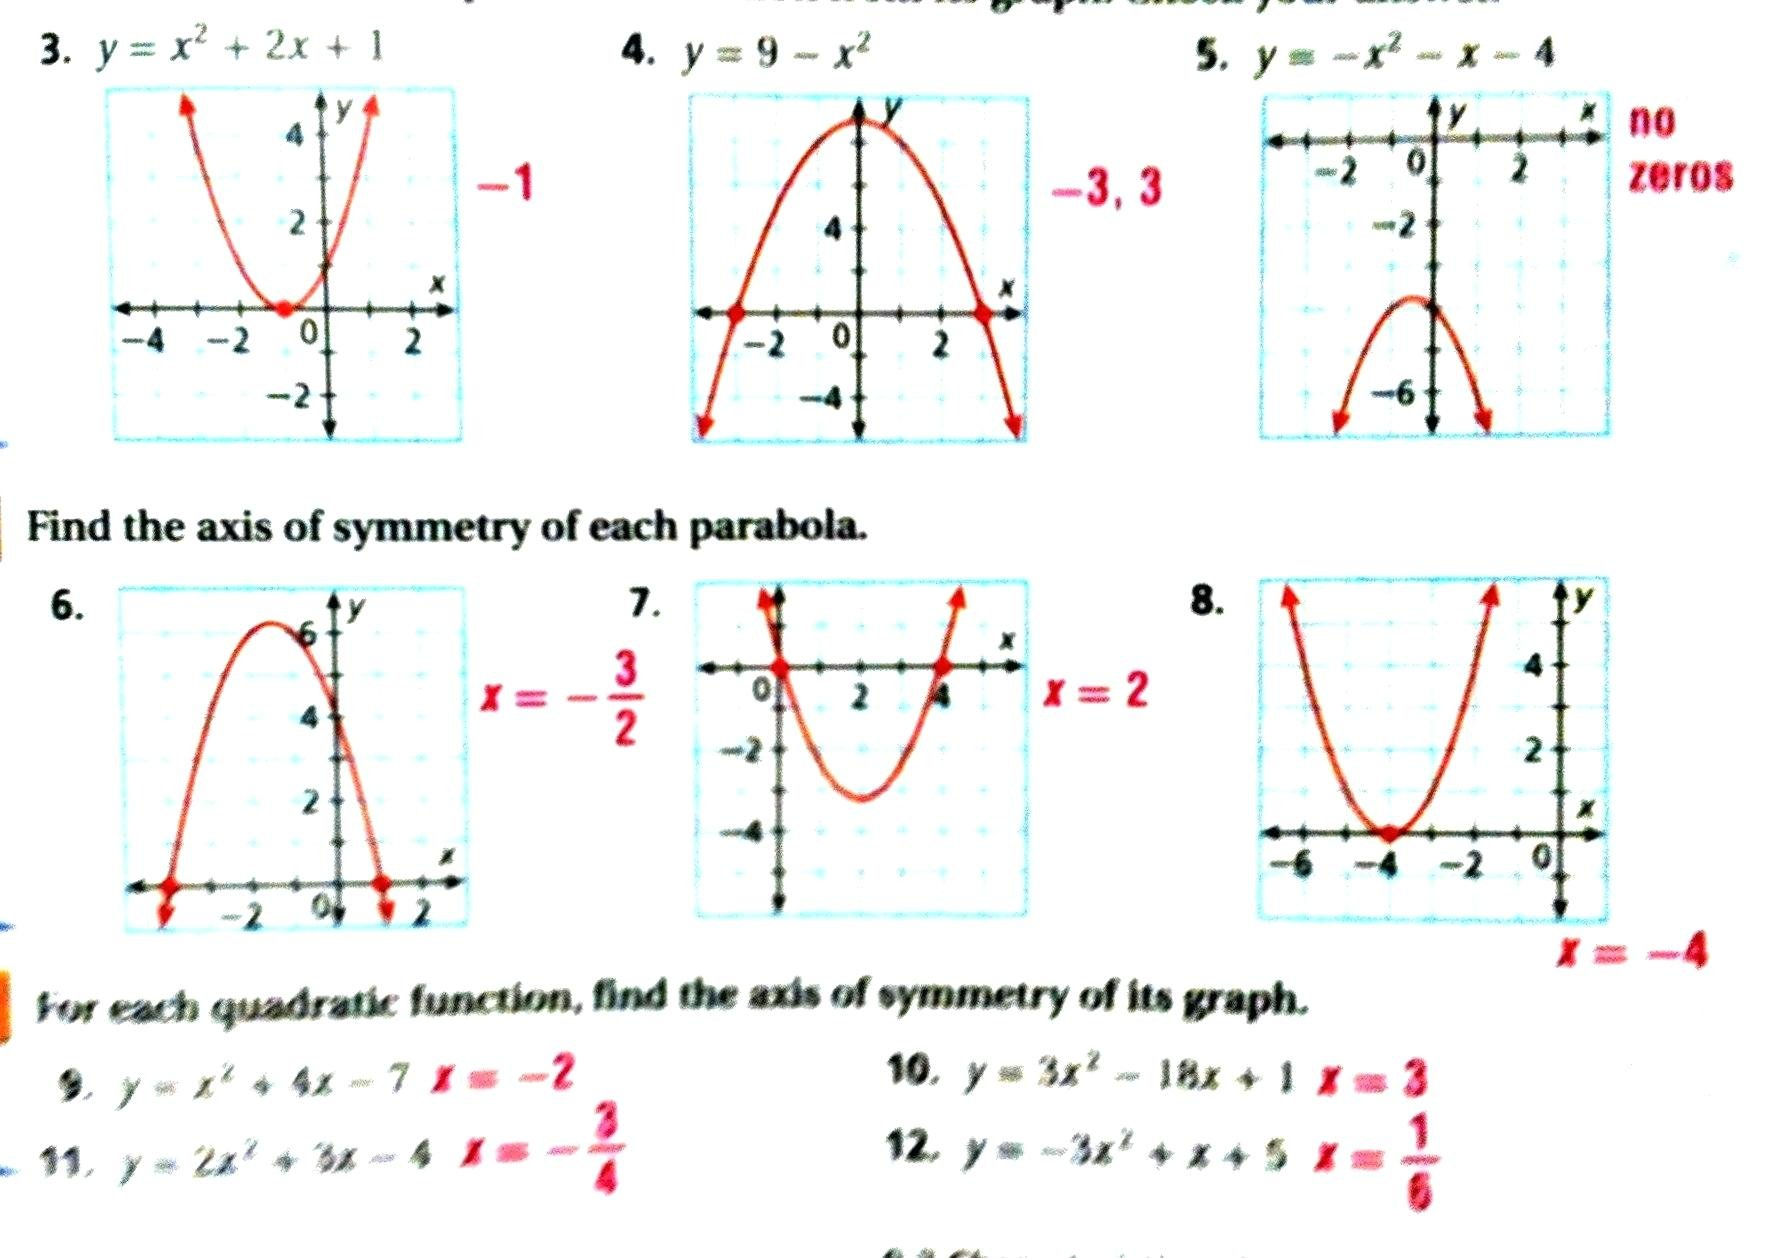 Algebra 1 Quadratic Formula Worksheet Answers Math Characteristics Pertaining To Quadratic Functions Worksheet Answers